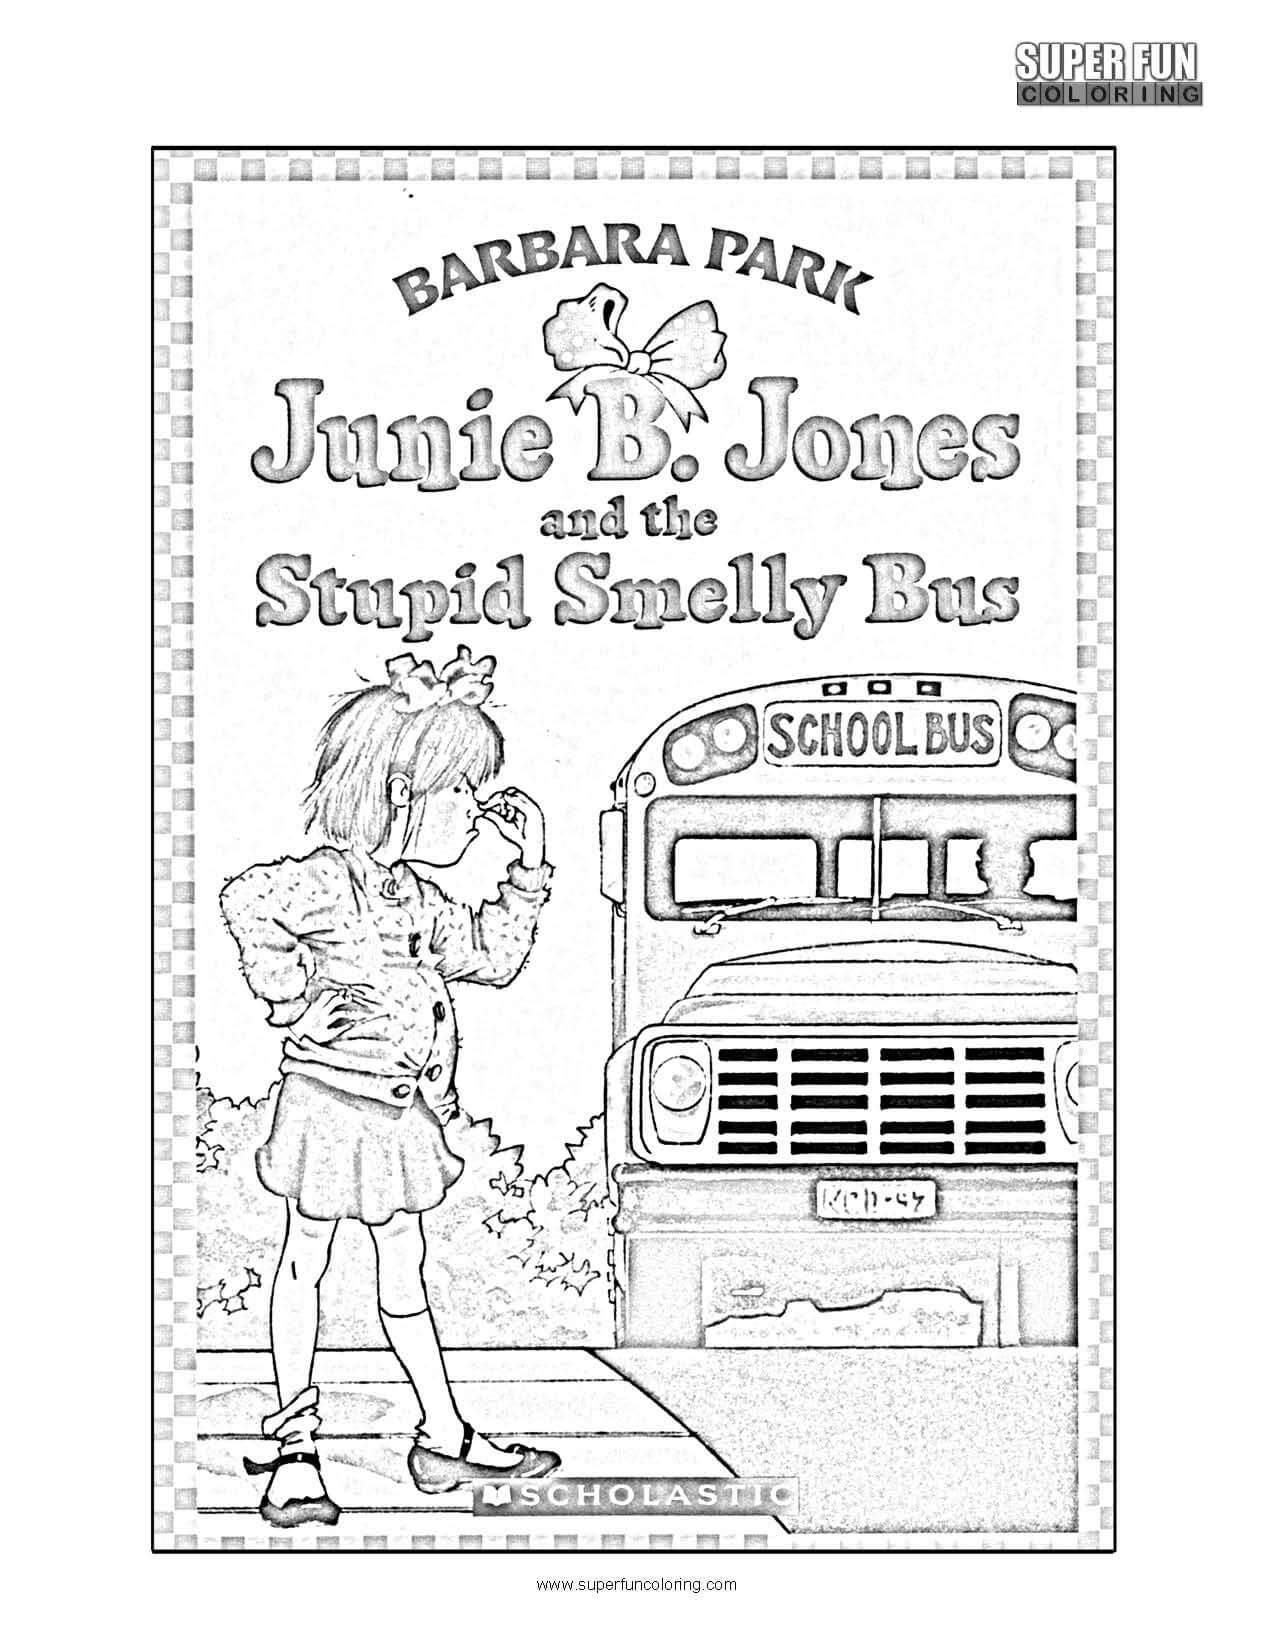 junie b jones coloring pages to print junie b jones free coloring pages b pages coloring junie jones to print